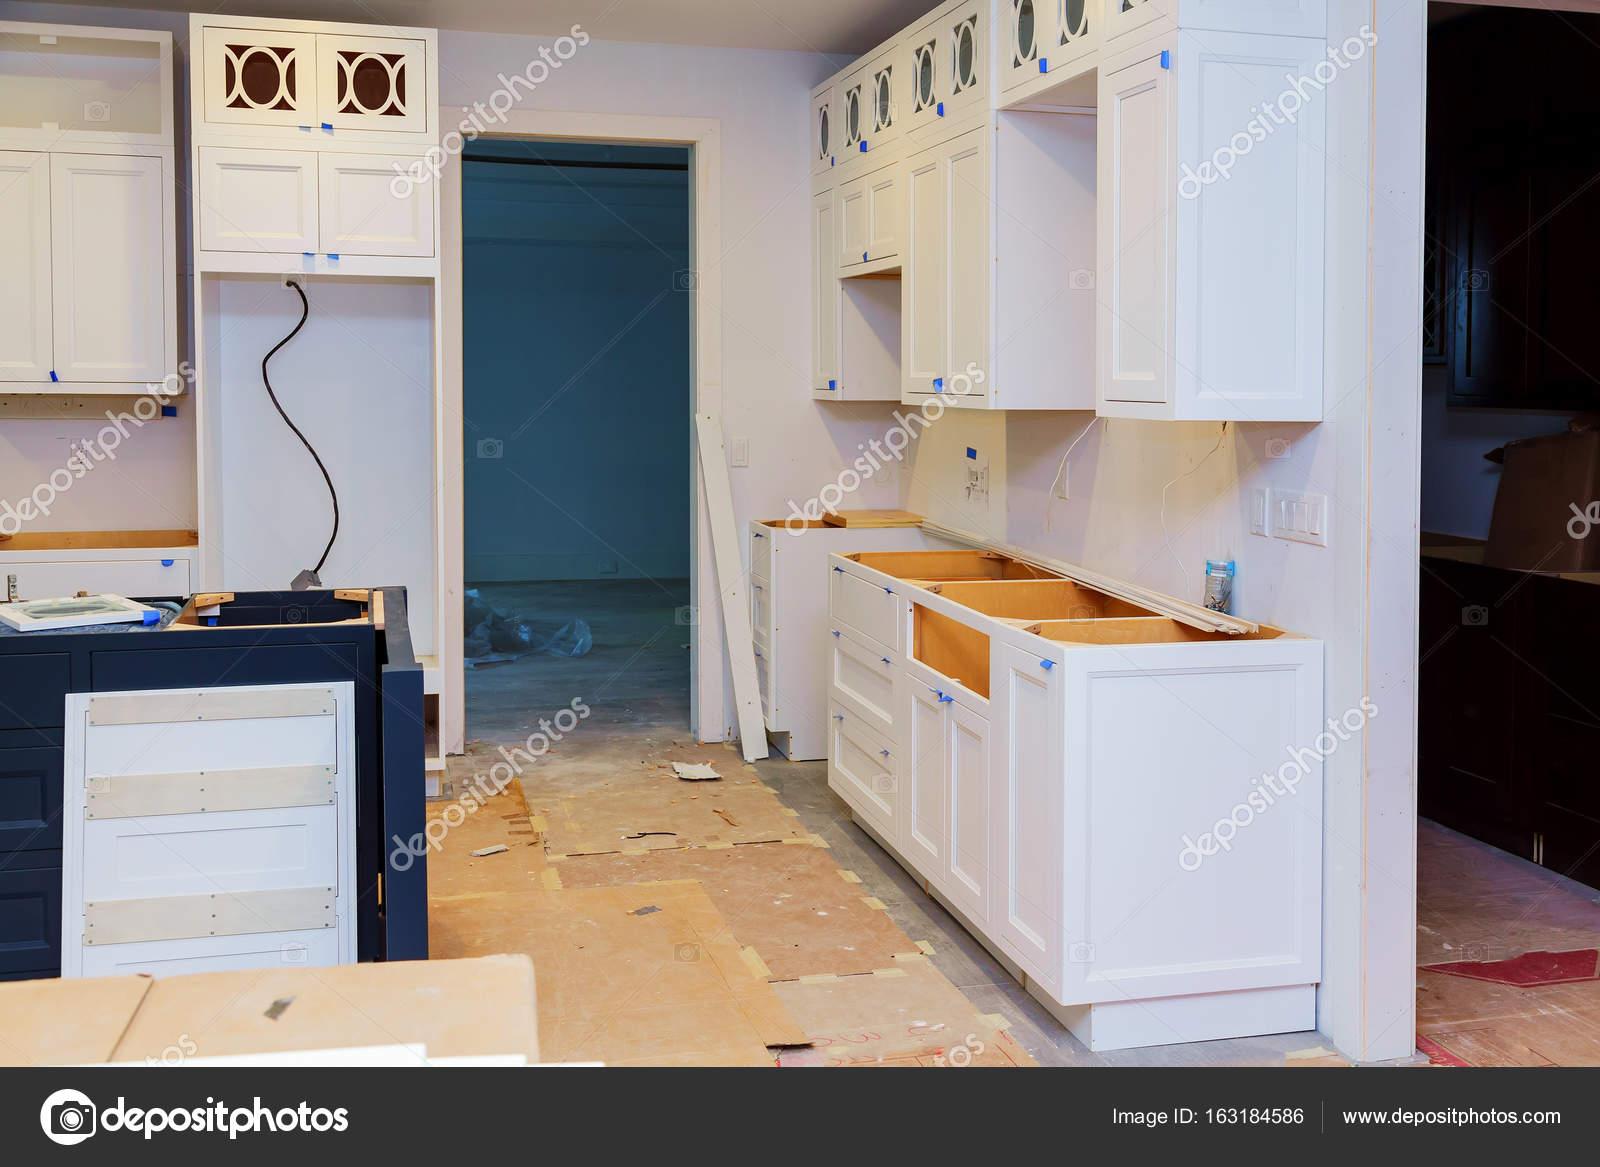 base kitchen cabinets vinyl flooring 自定义厨柜处于不同阶段的安装基地在中心的岛 图库照片 c photovs 163184586 图库